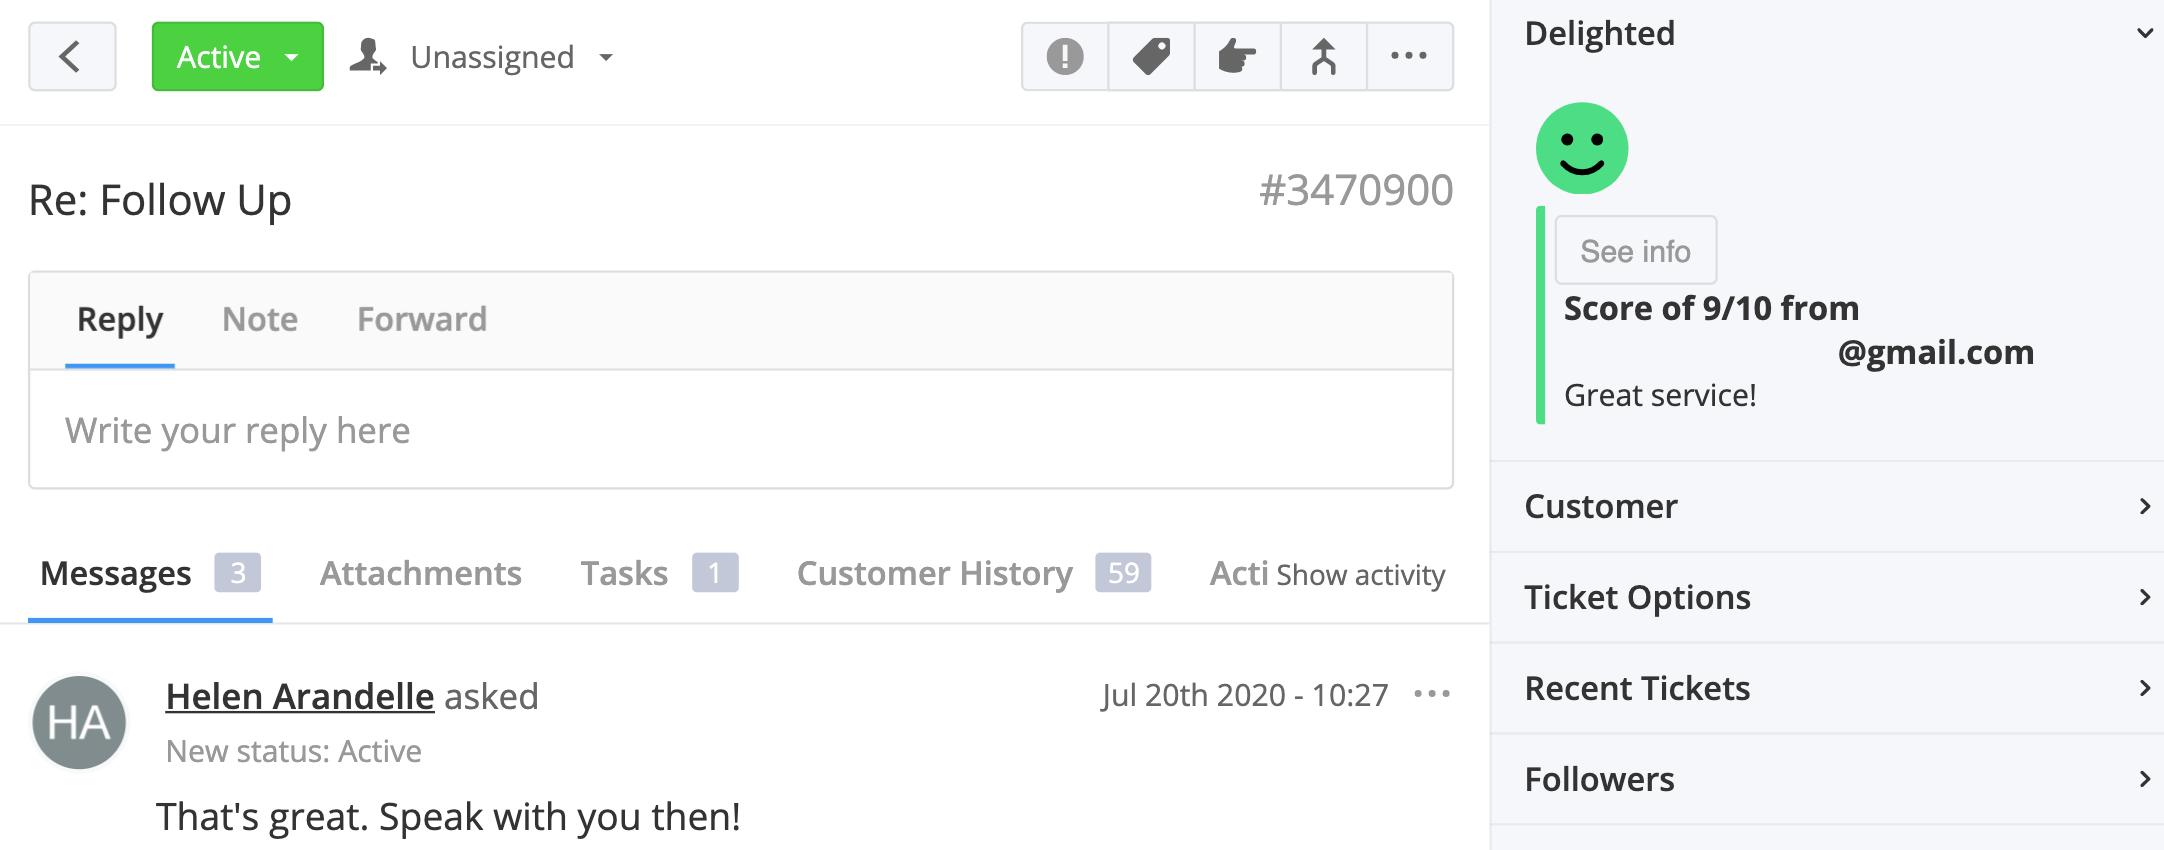 Delighted feedback in Teamwork Desk customer record